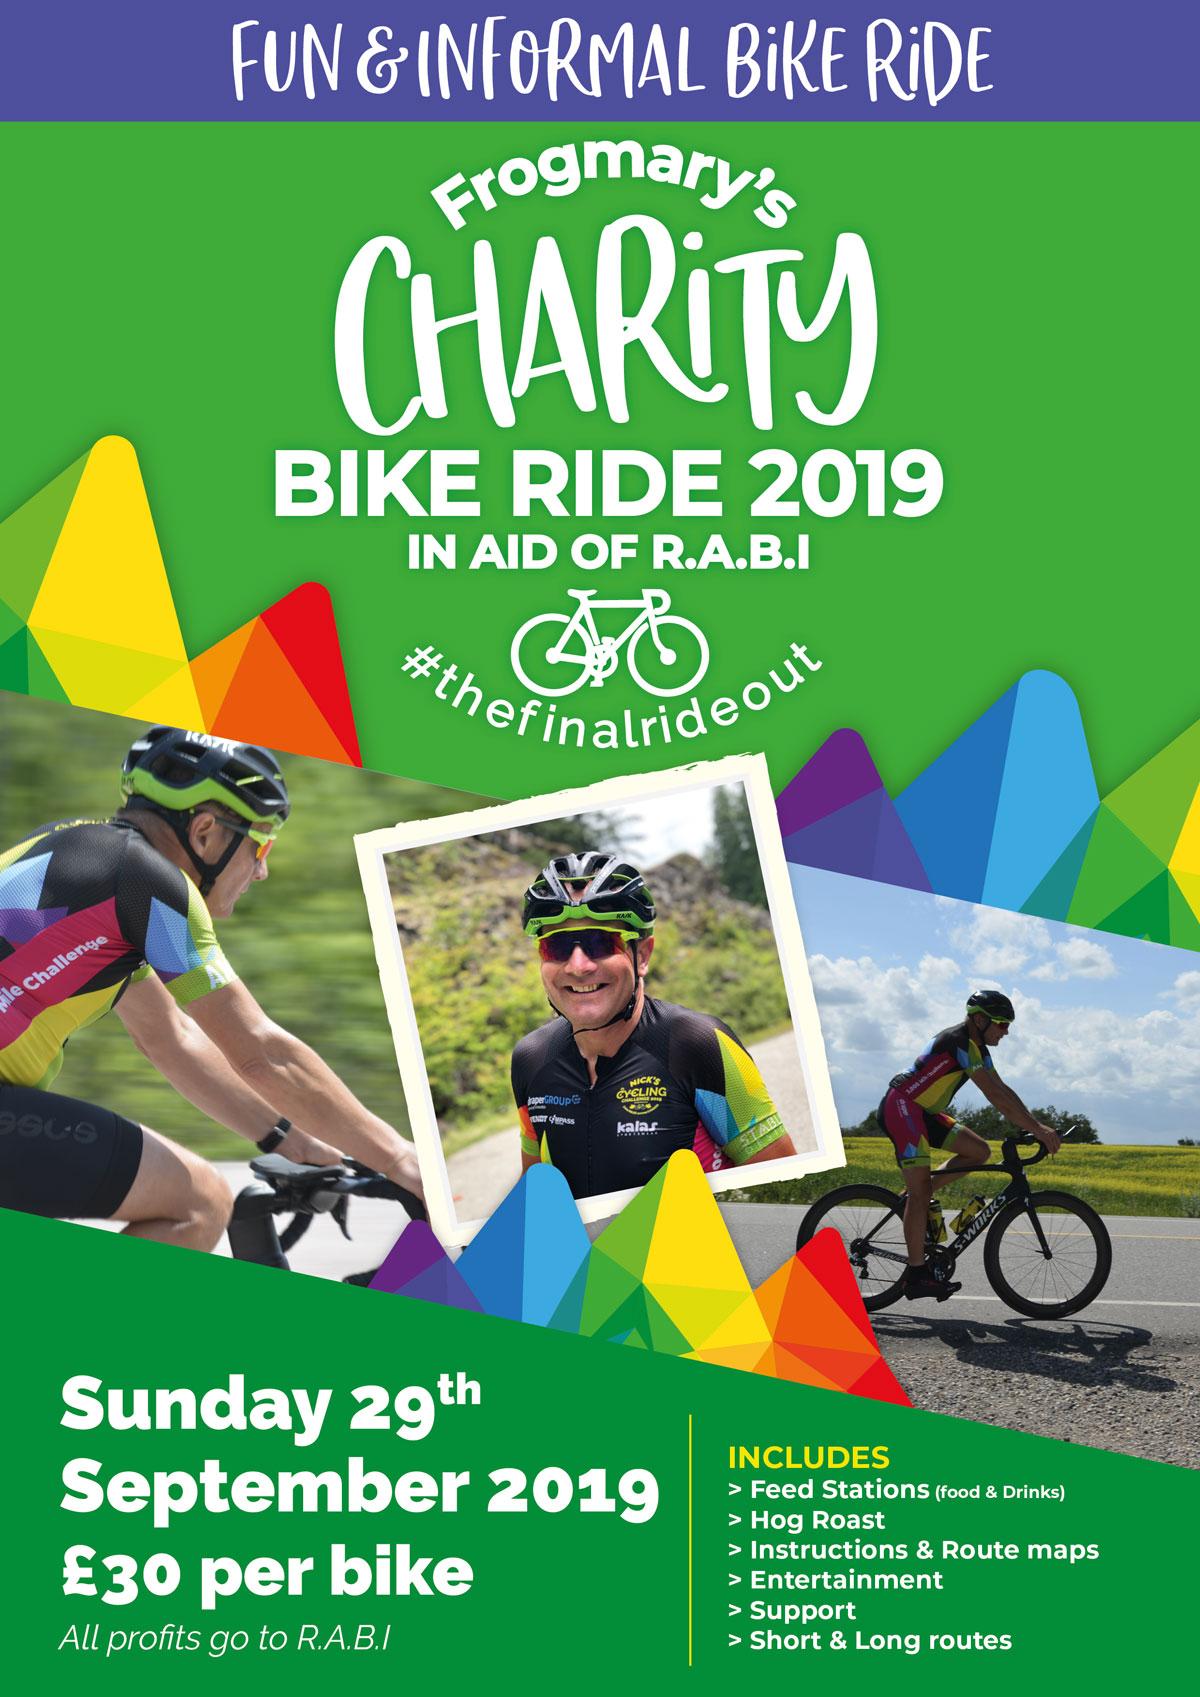 Nick's Cycling Challenge Charity Bike Ride